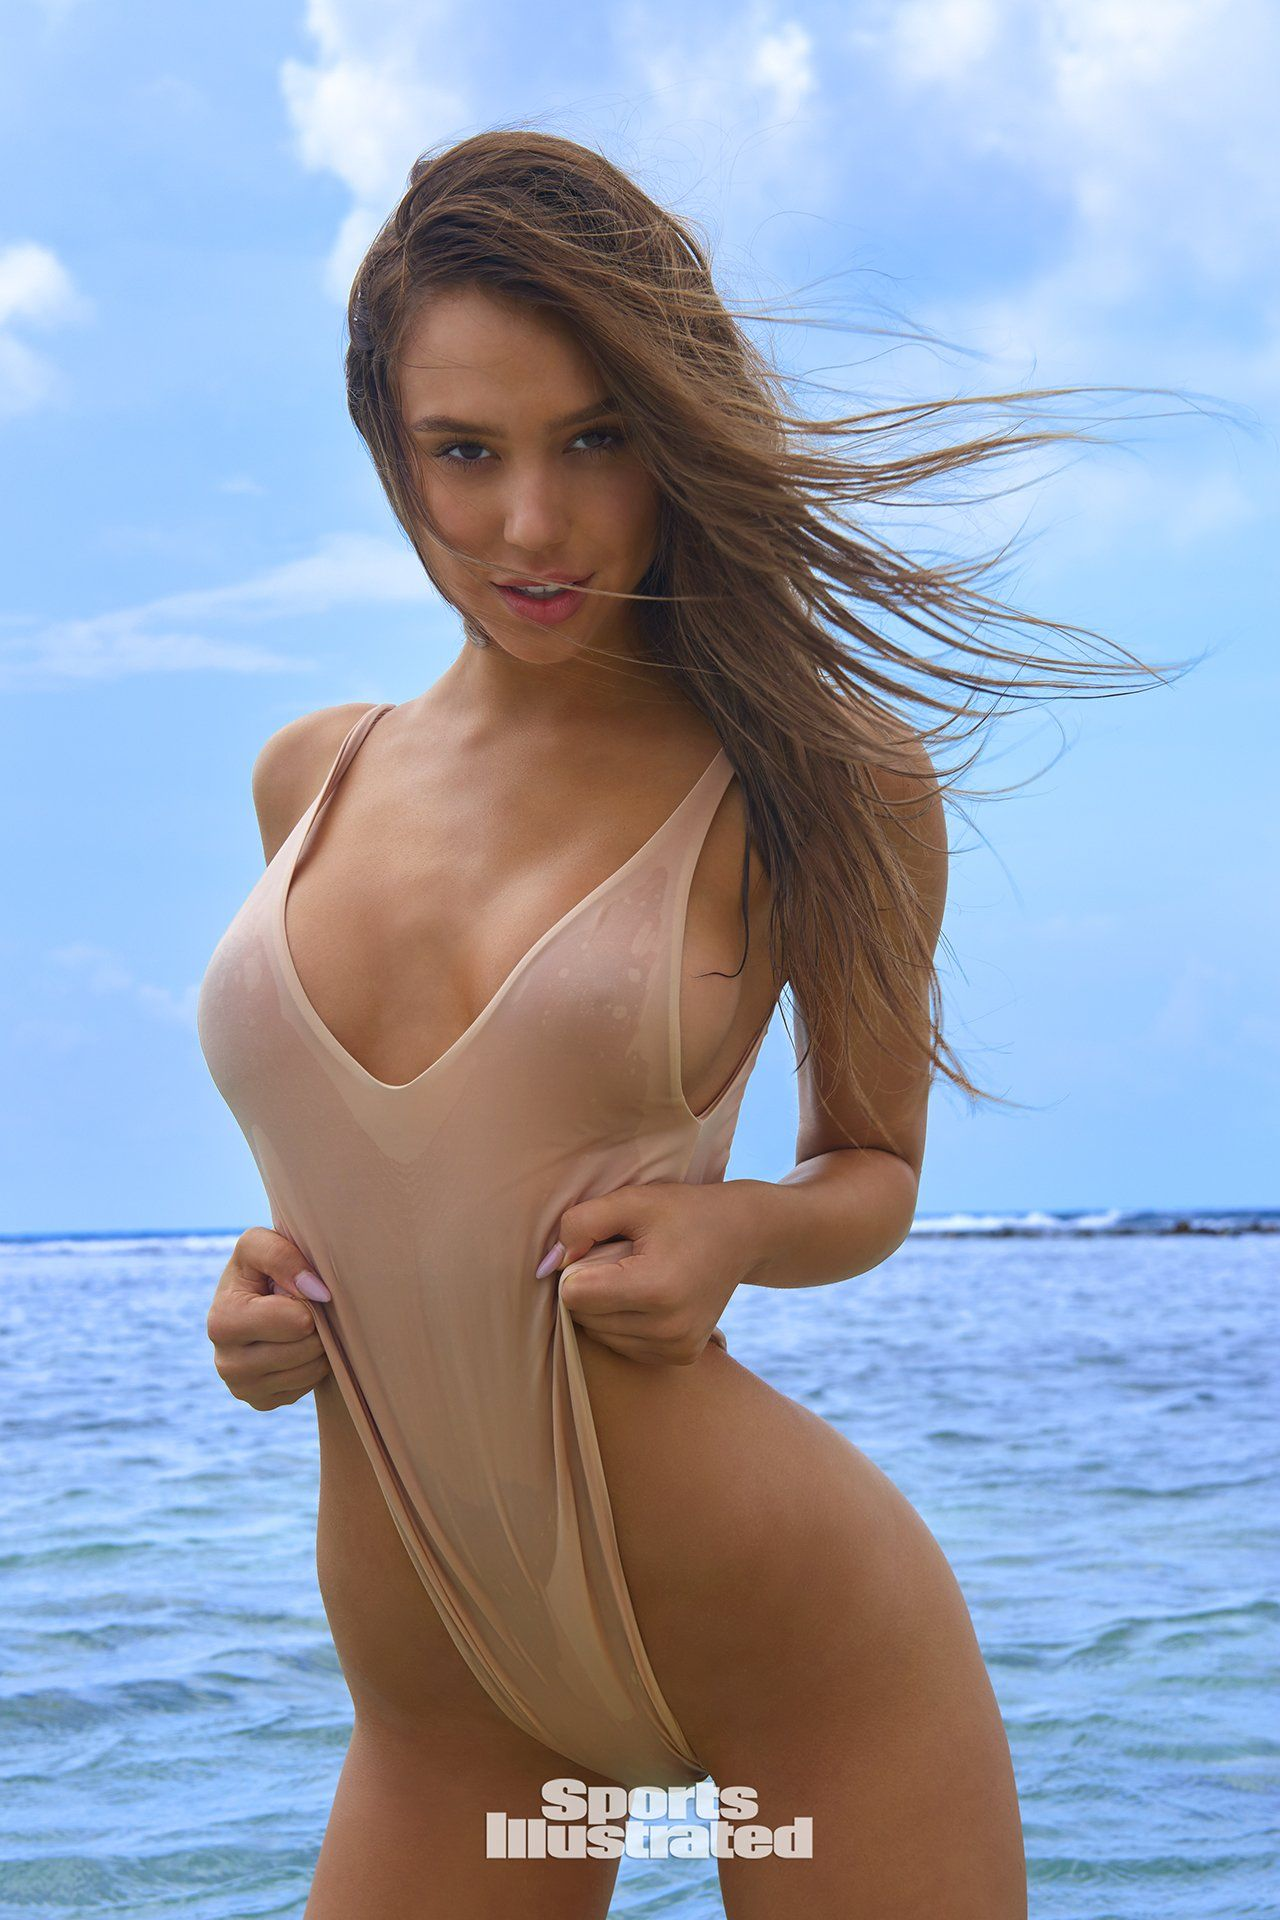 Alexis ren sexy 27 Photos nudes (17 photos), Feet Celebrites pics